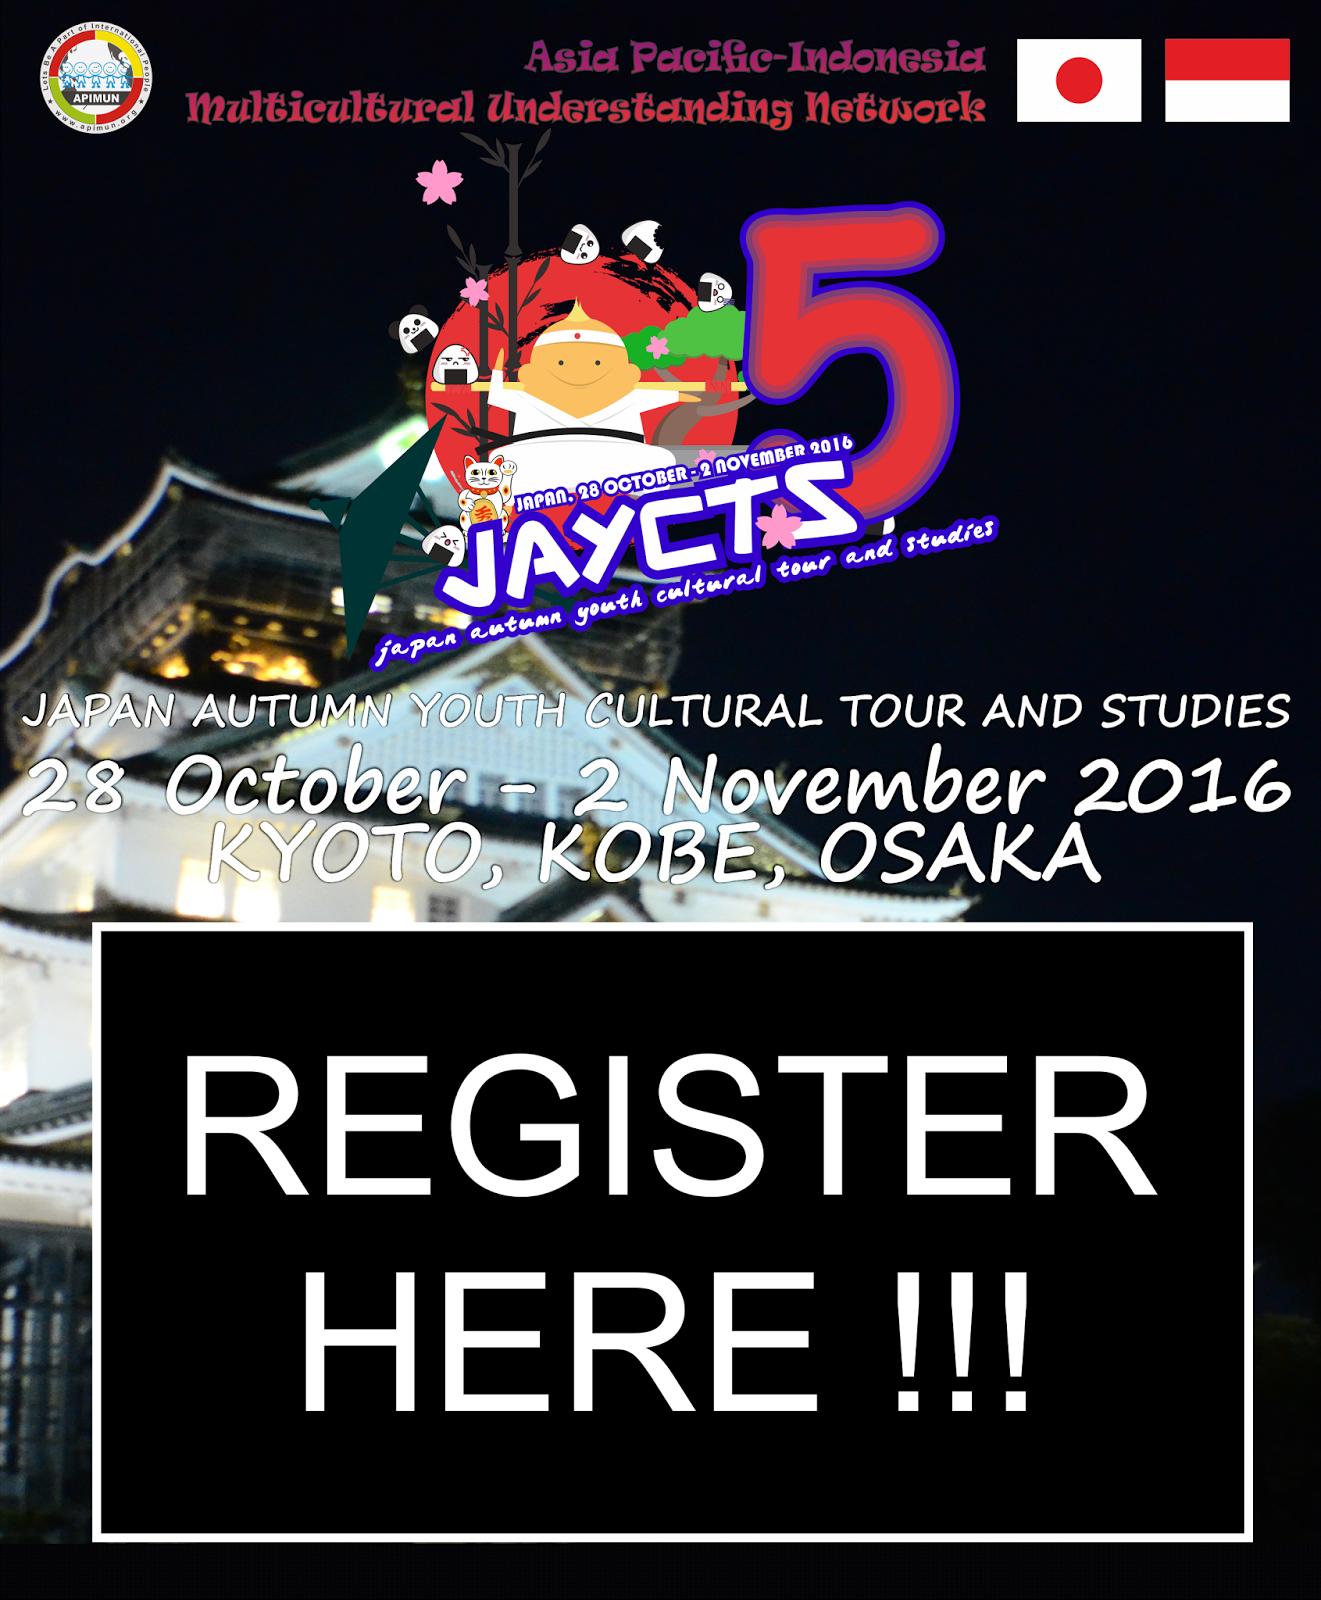 JAYCTS 5